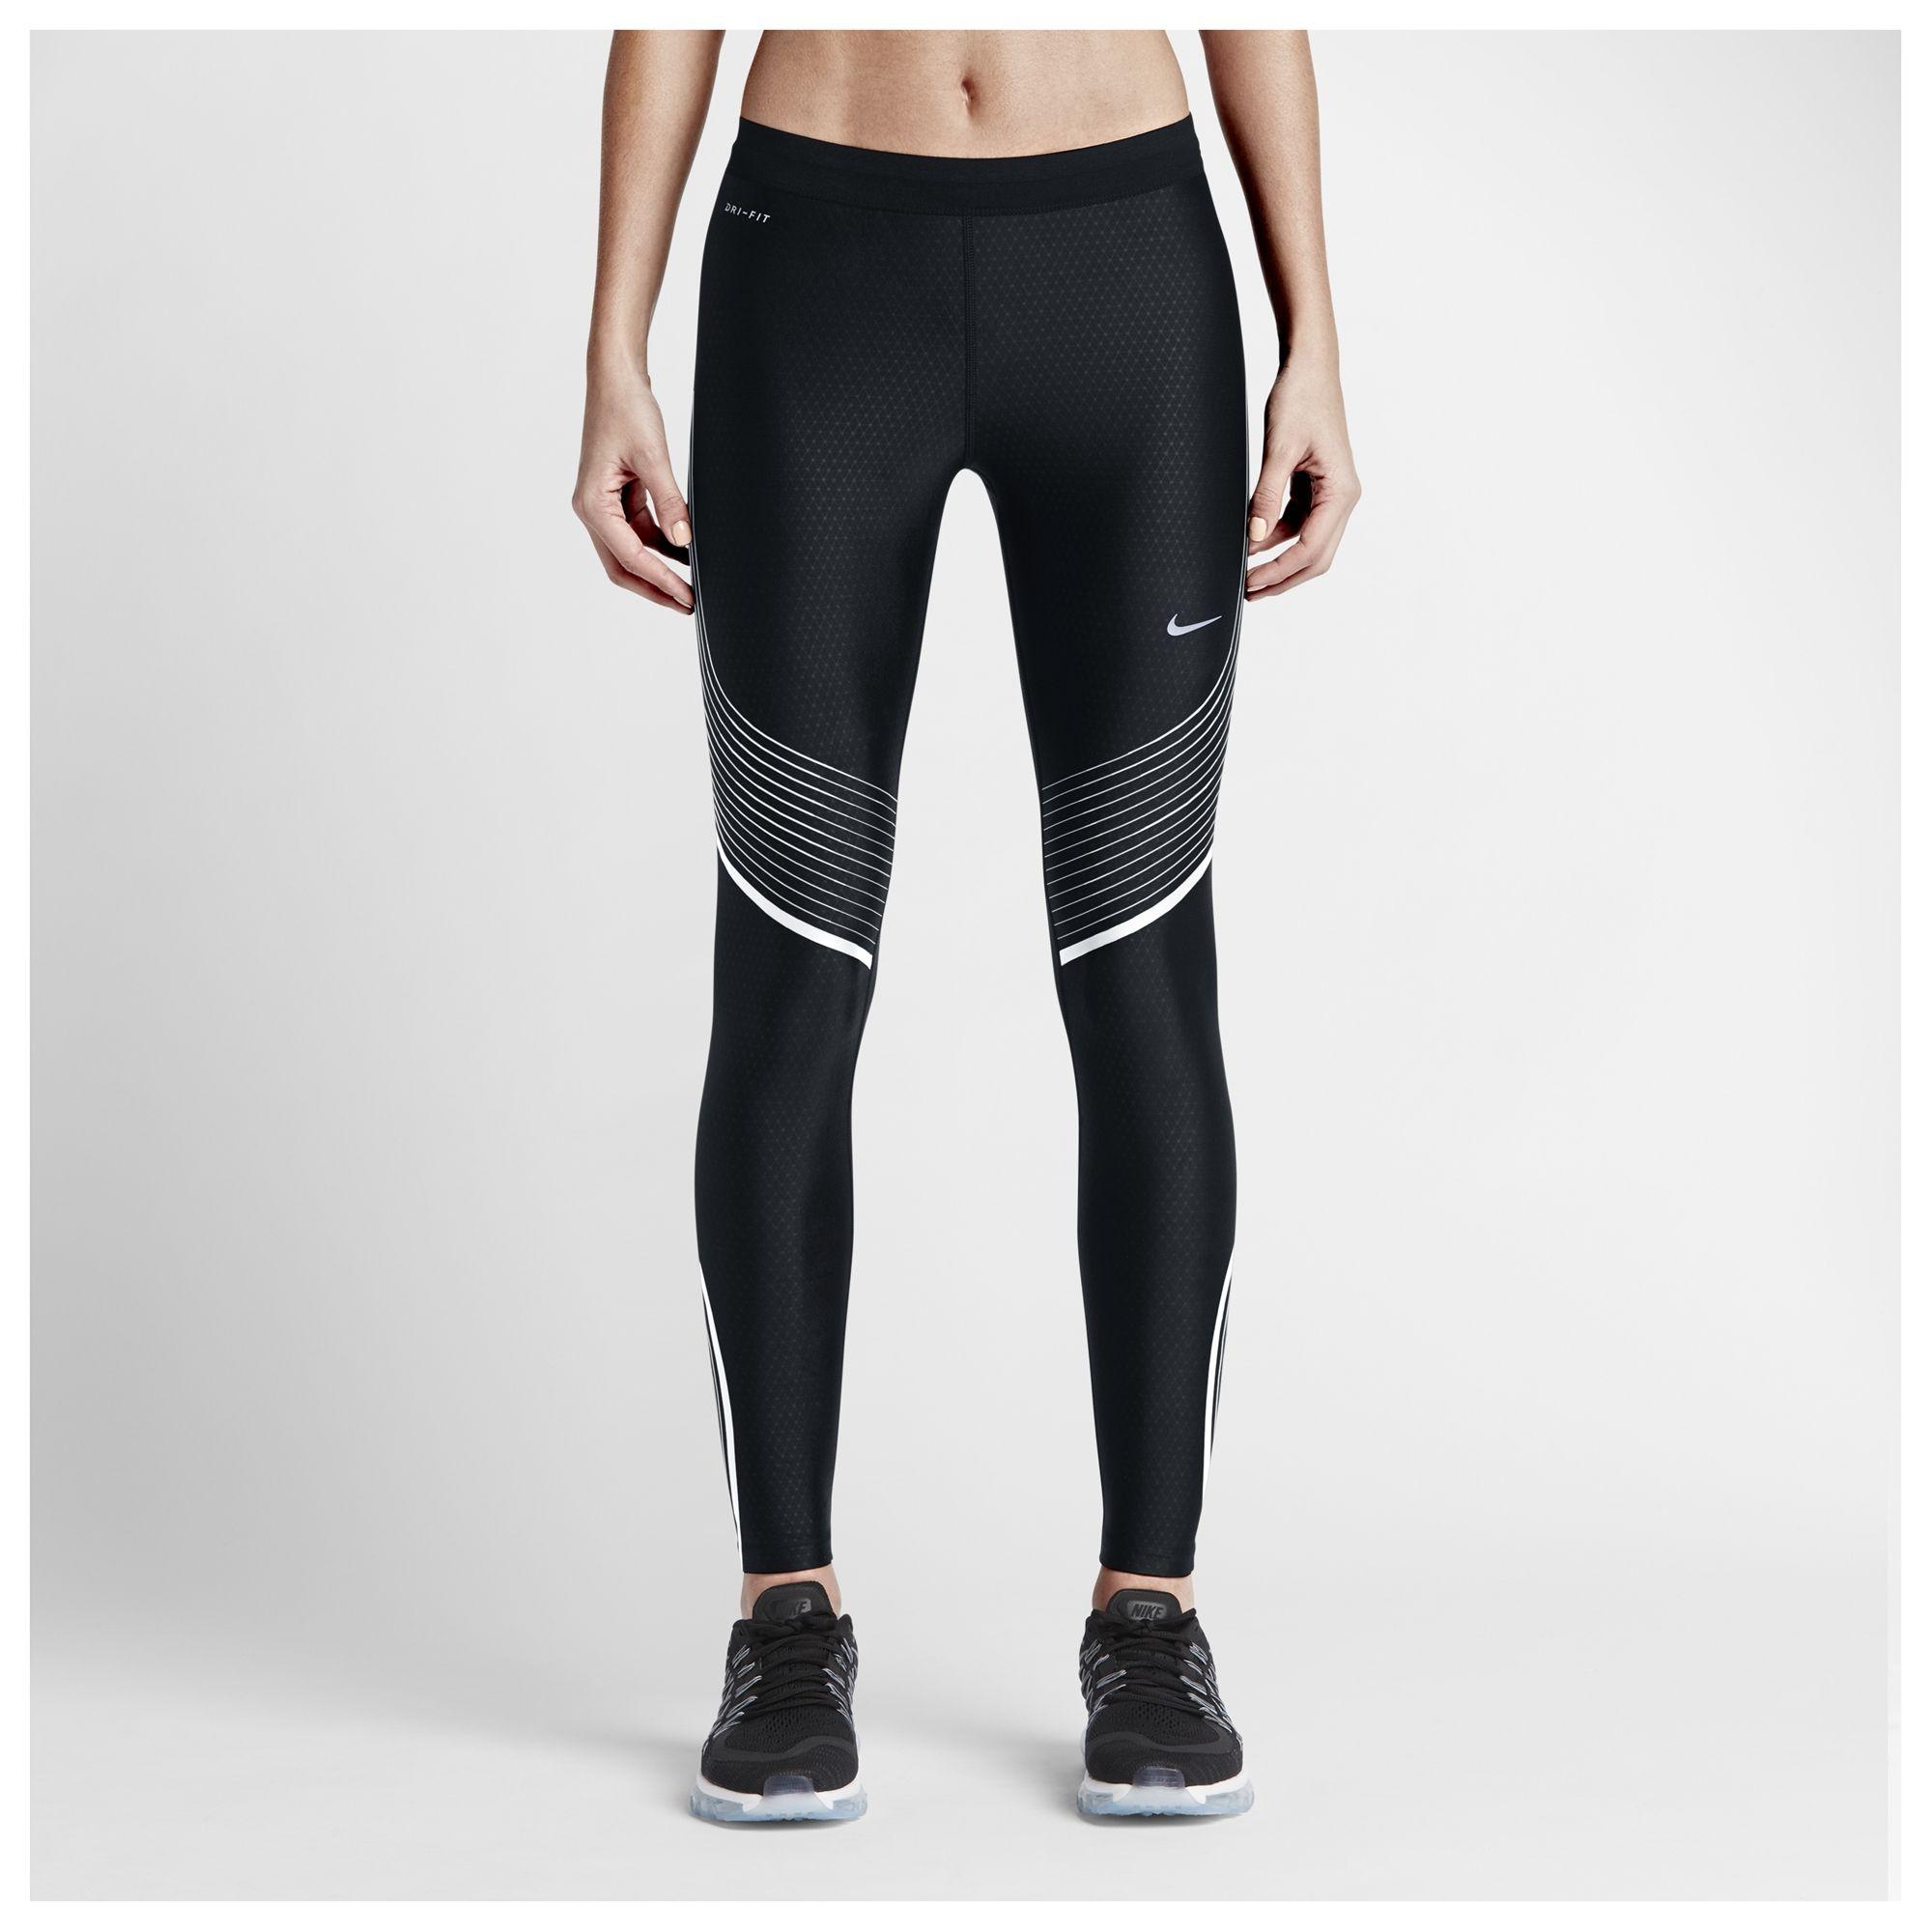 a7a90916c532b Legging Nike Power Speed Tight Feminina